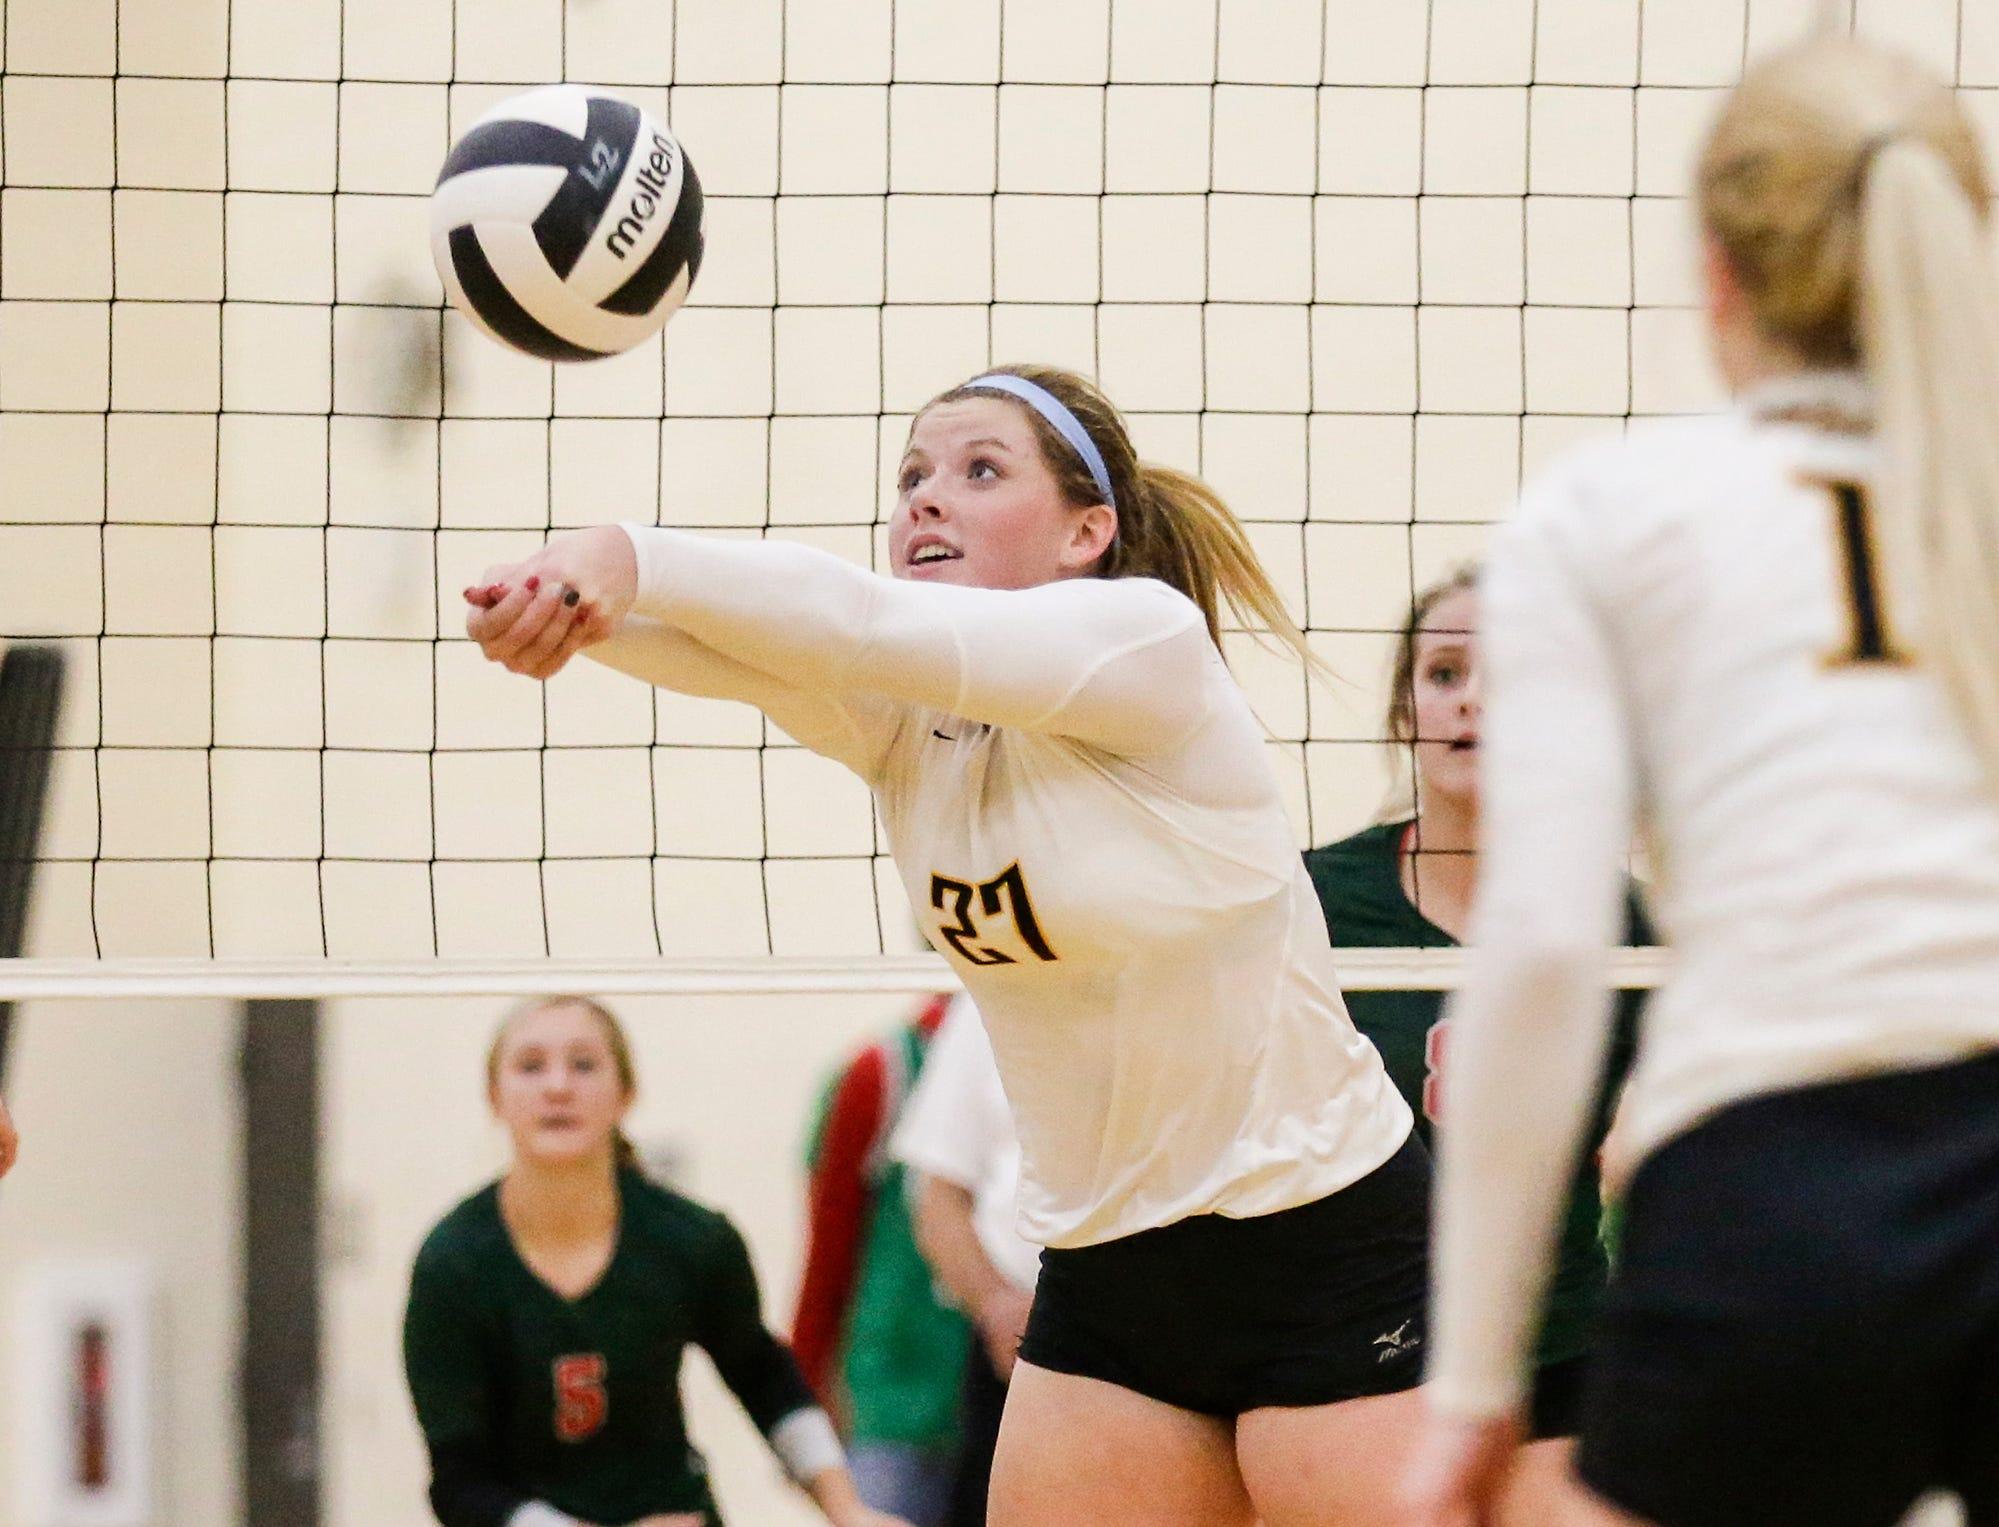 Waupun High School volleyball's Haley Huenink hits the ball against Berlin High School during their WIAA regional quarter-final playoff game Tuesday, Oct. 16, 2018, in Waupun.